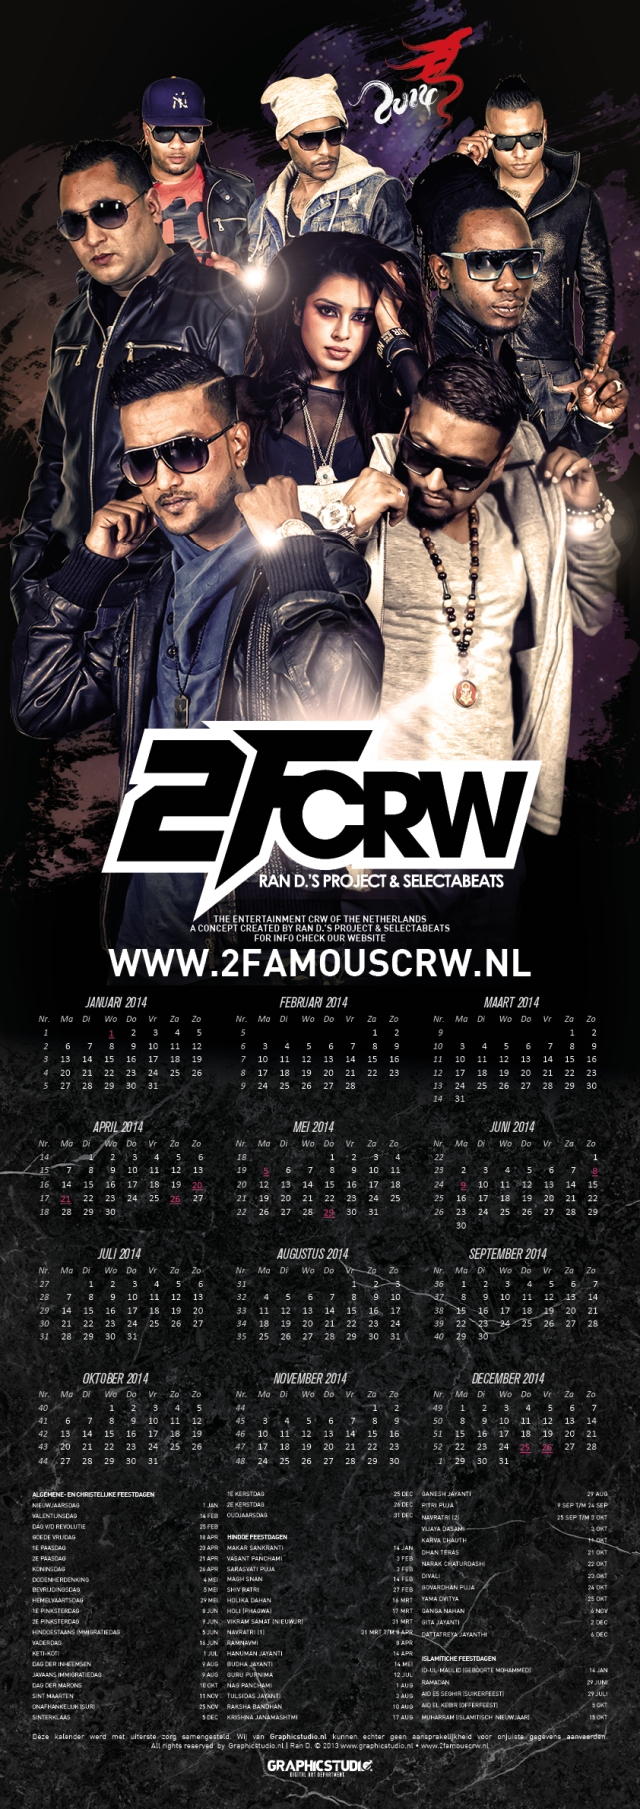 2FCRW-CALENDER-20141